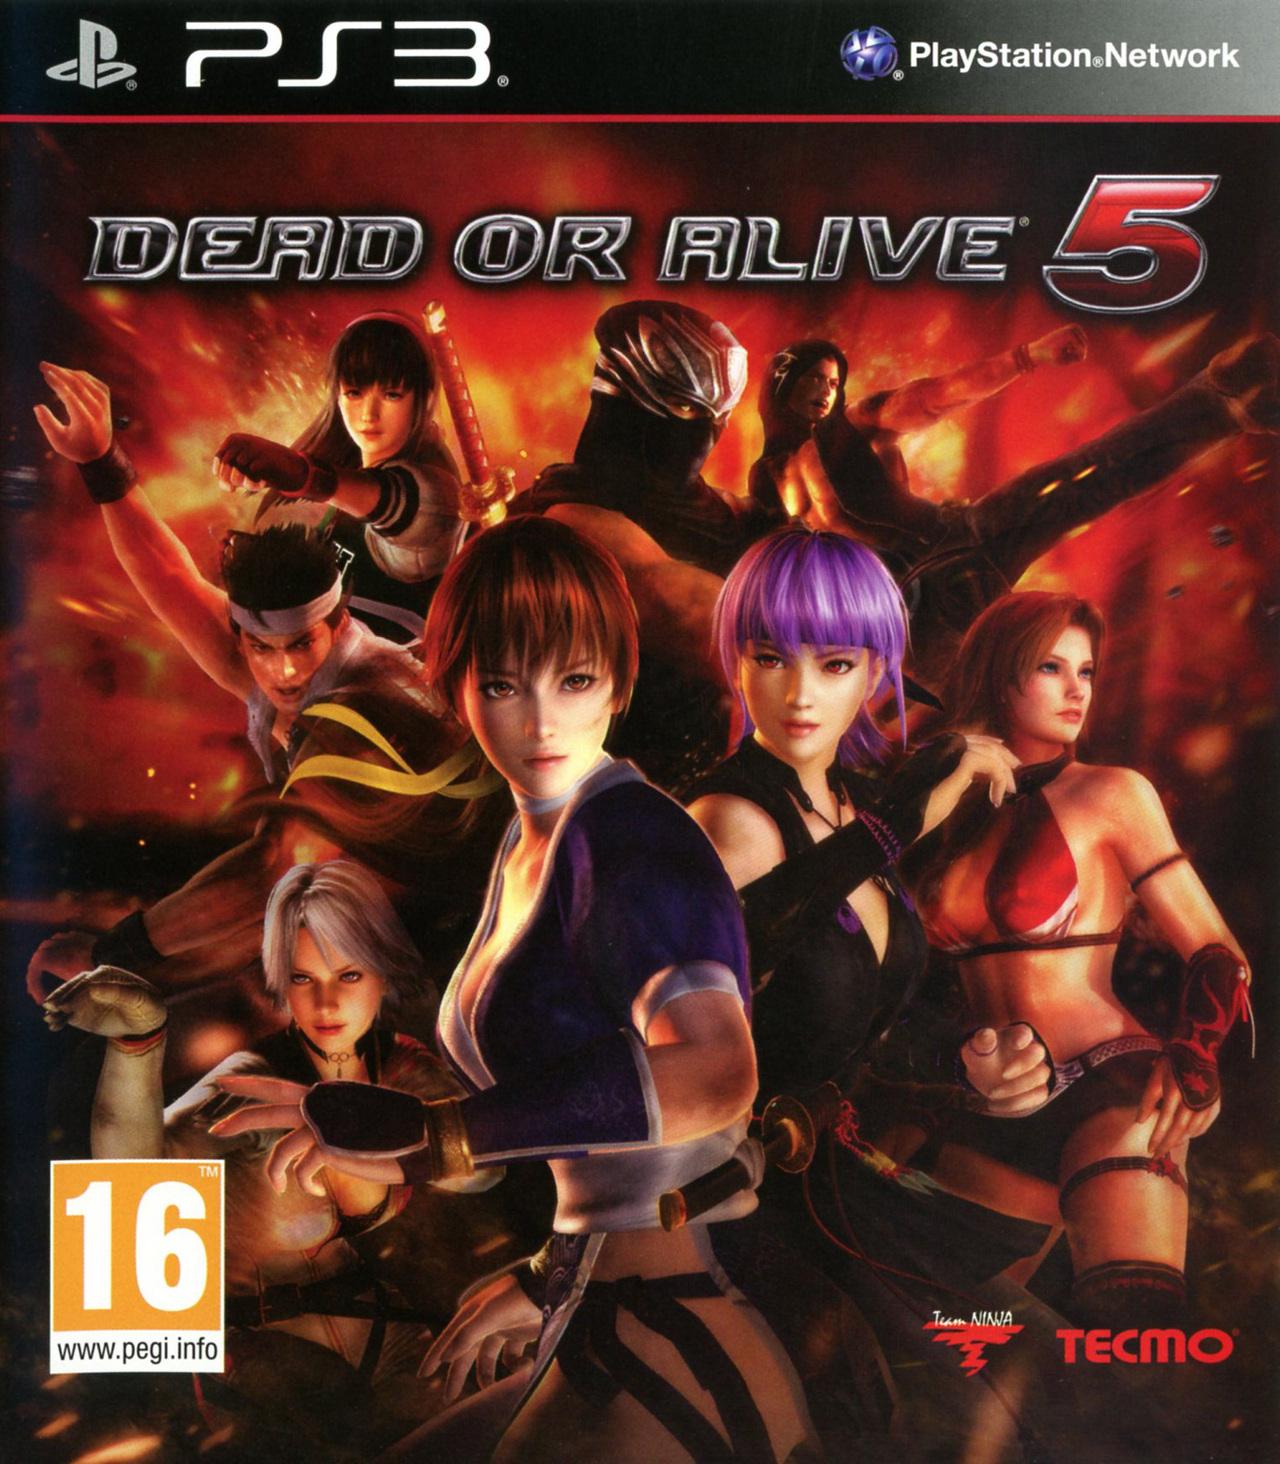 Dead or Alive 5 sur PlayStation 3 - jeuxvideo.com